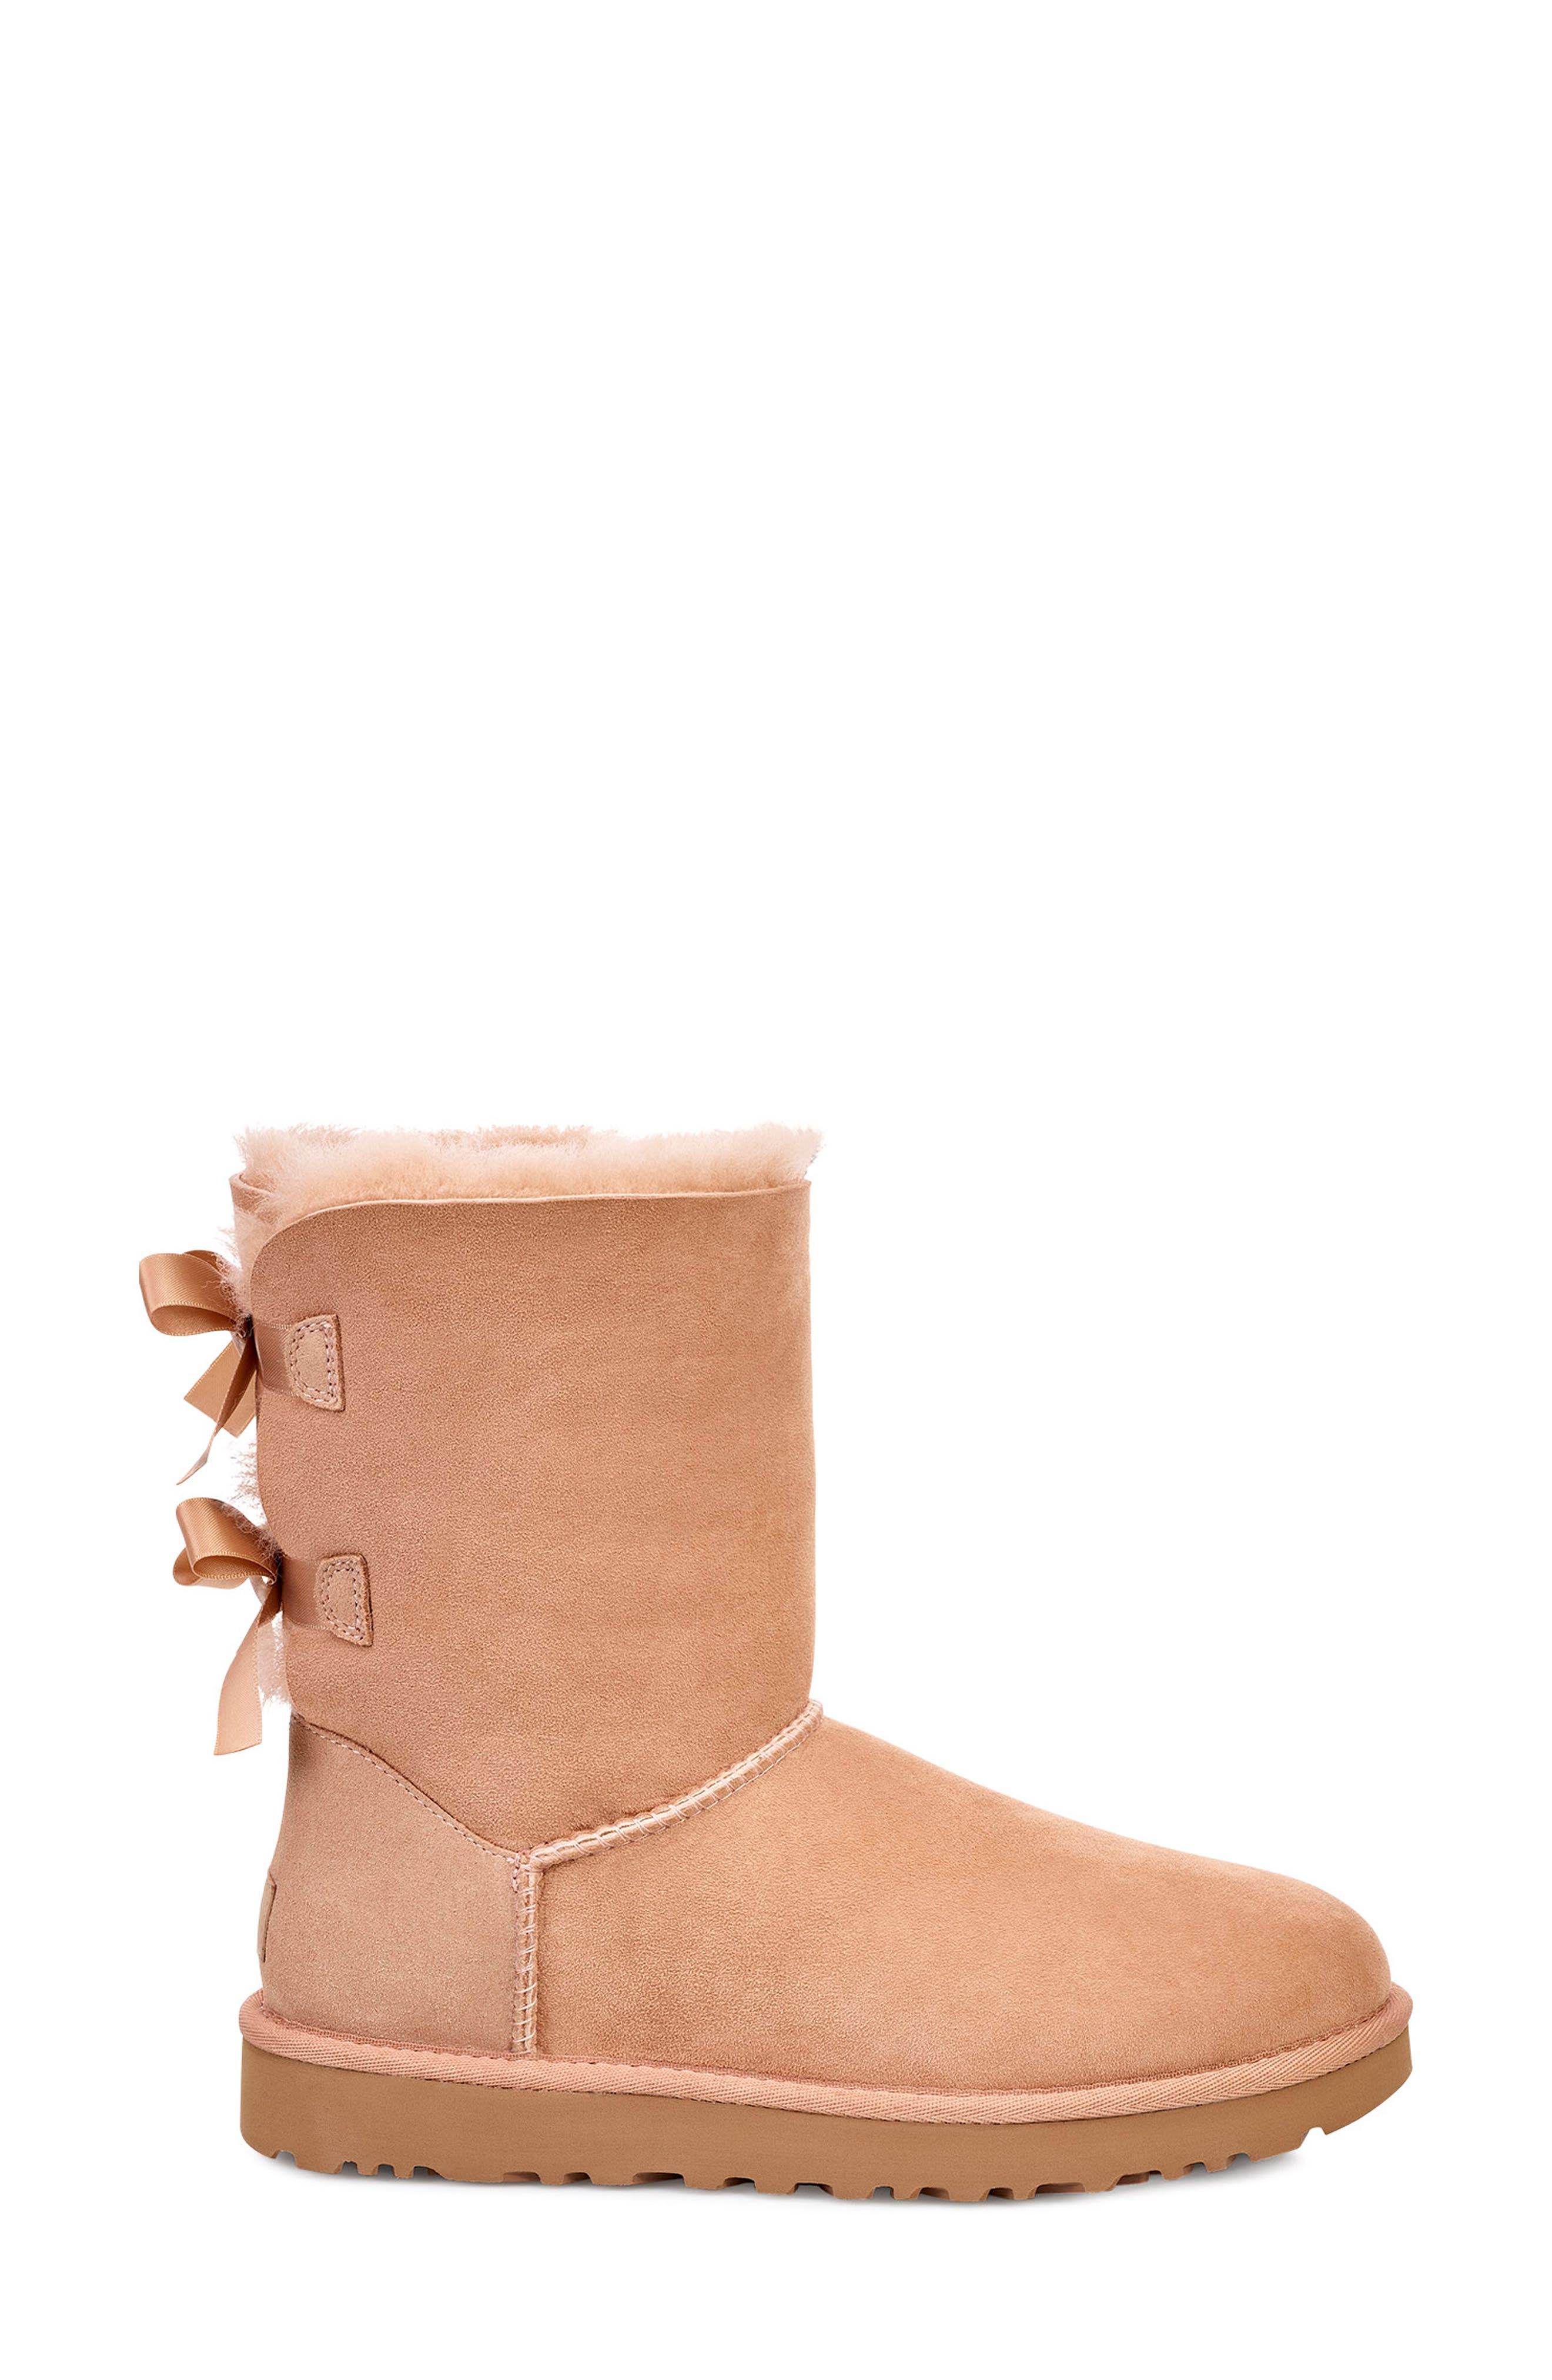 ugg bailey bow ii genuine shearling boot women nordstrom rh shop nordstrom com